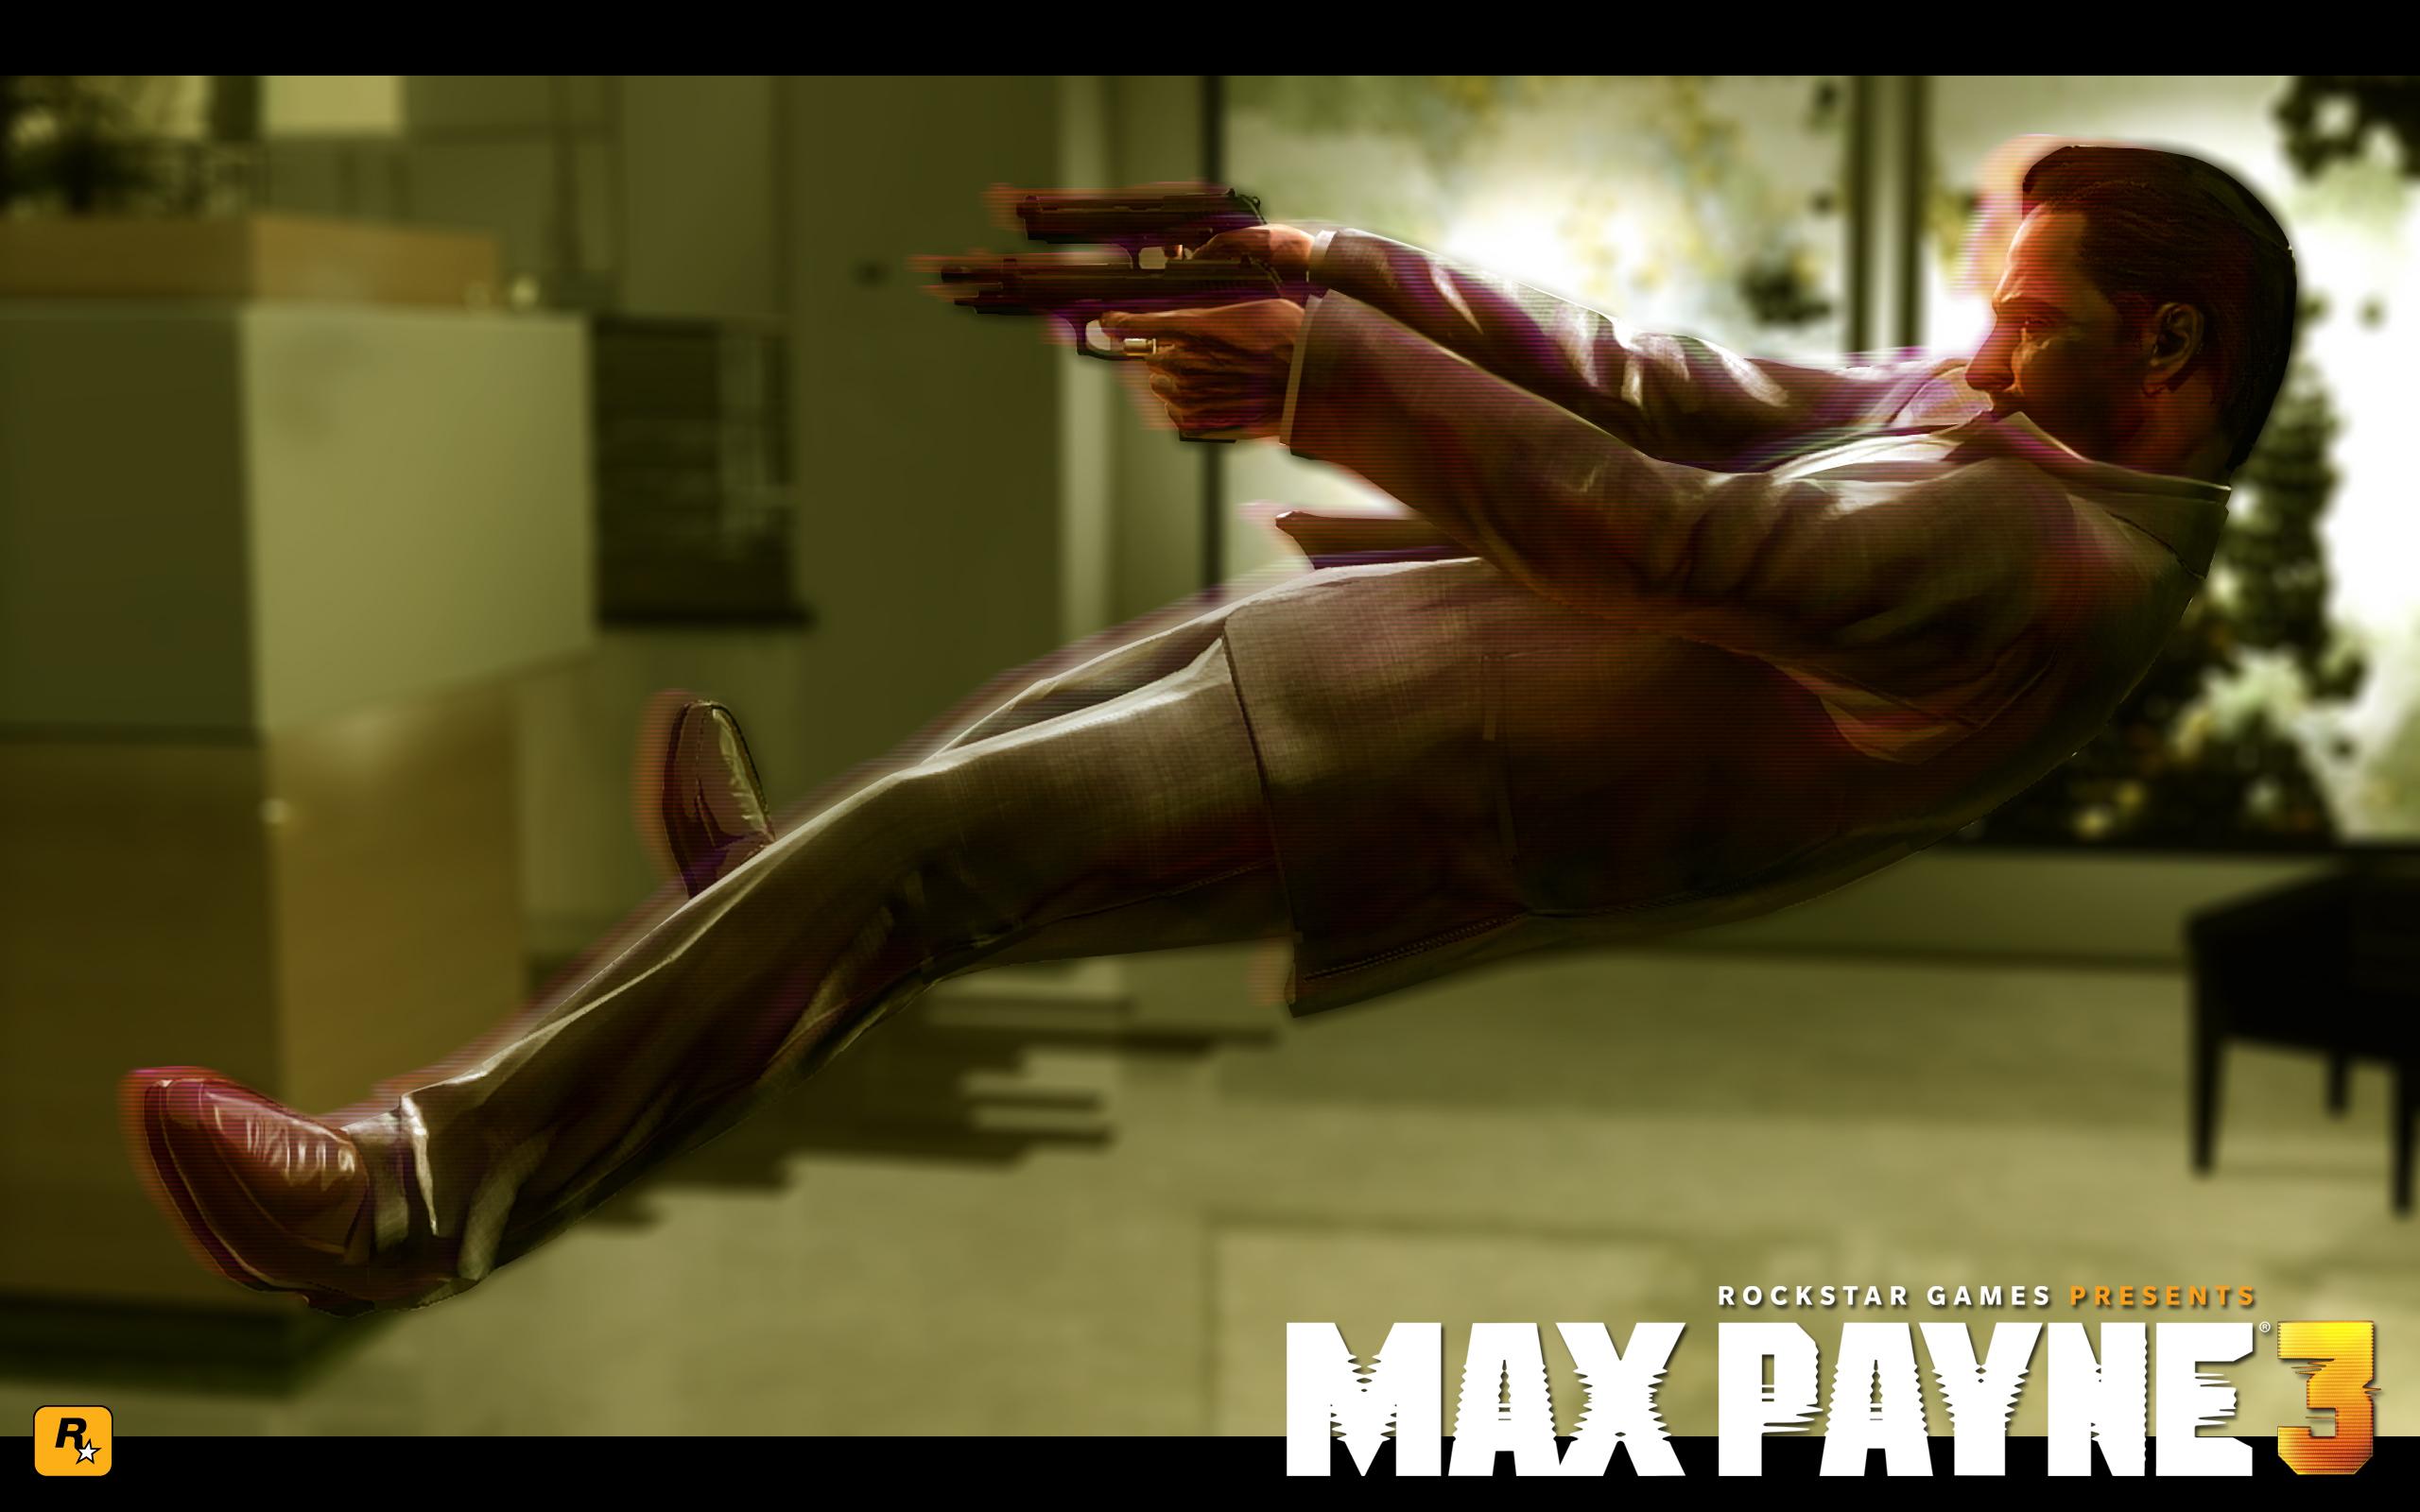 Max Payne 3 wallpaper 9